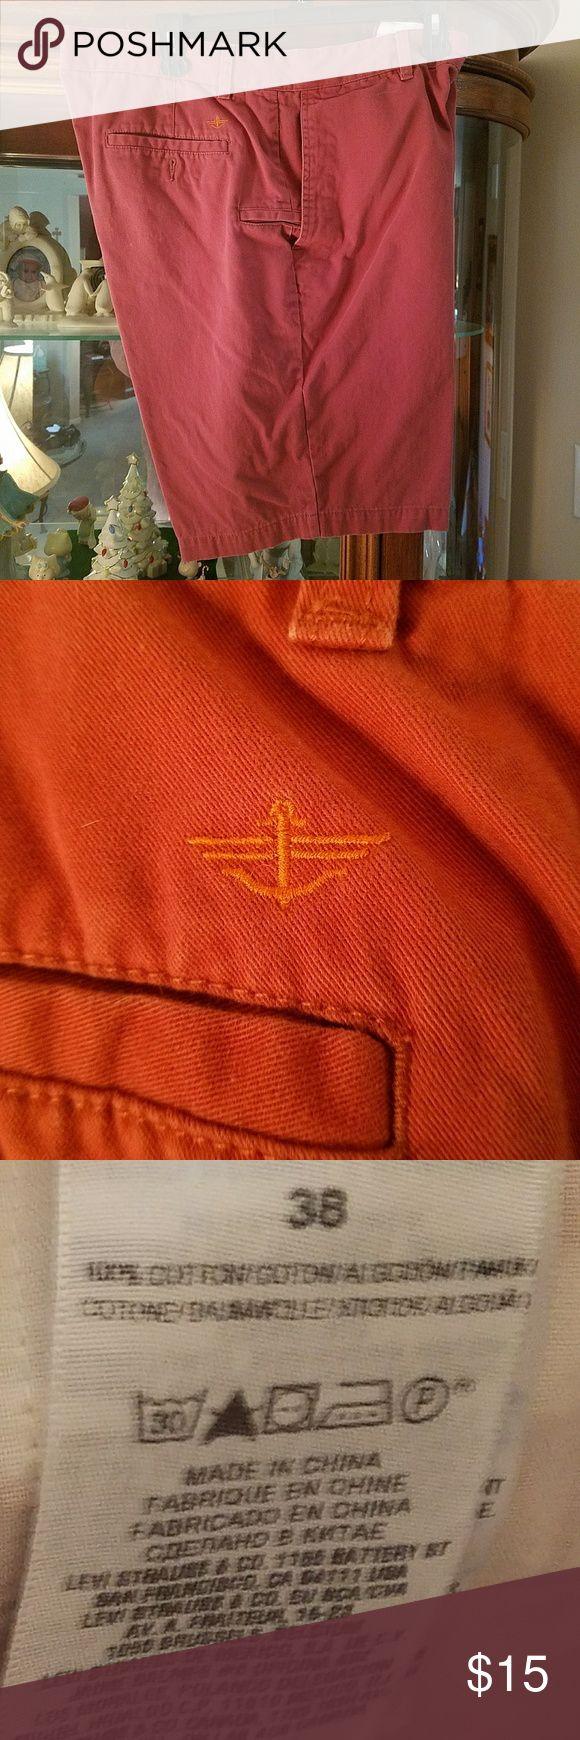 Docker Men's Khaki Shorts Like New Color - Light Red Size - 38w Dockers Shorts